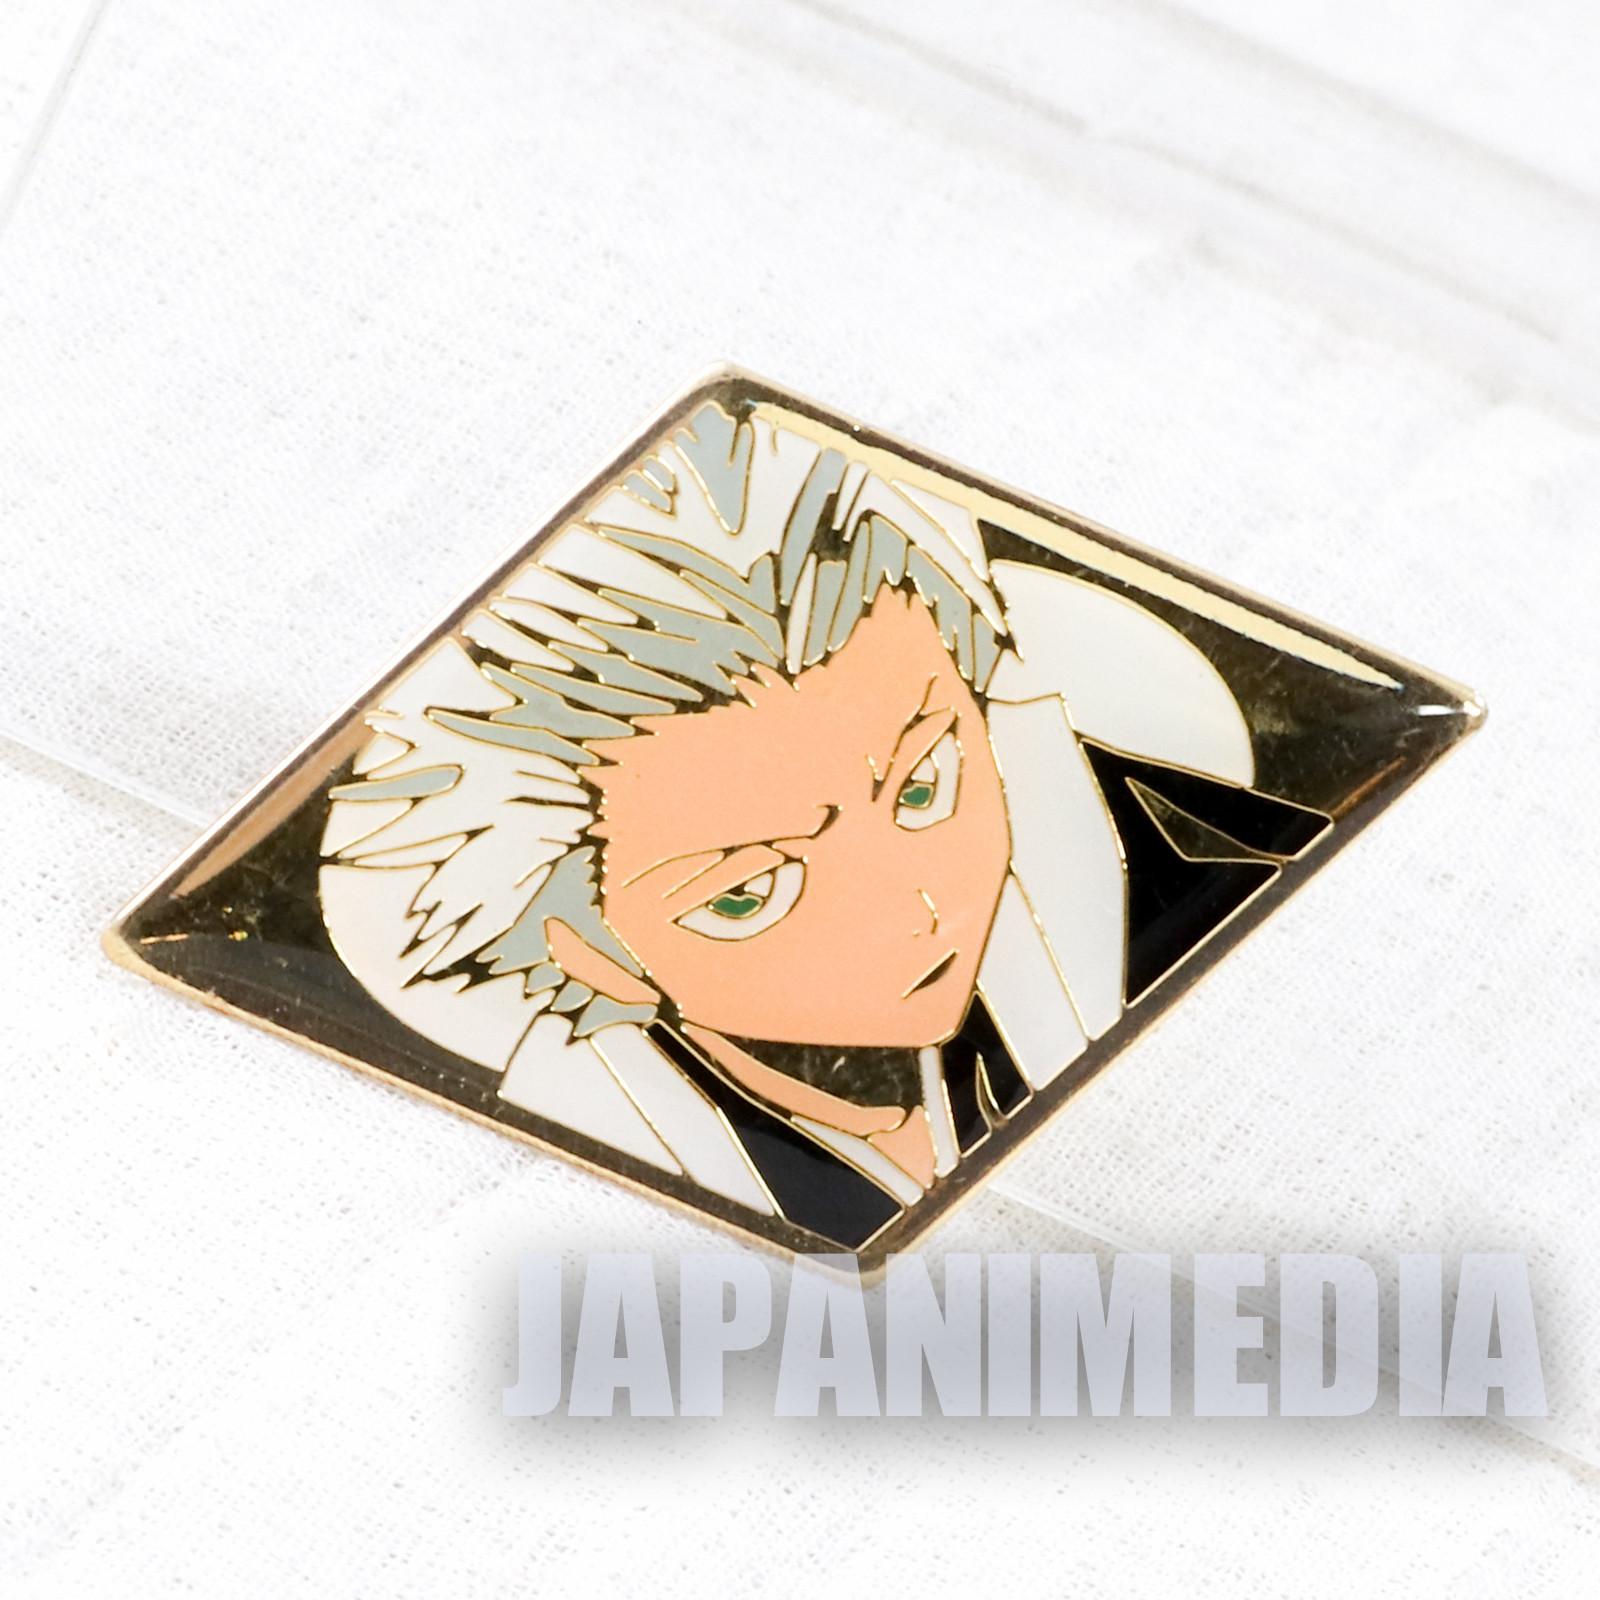 BLEACH Toshiro Hitsugaya Character Pins JAPAN ANIME MANGA